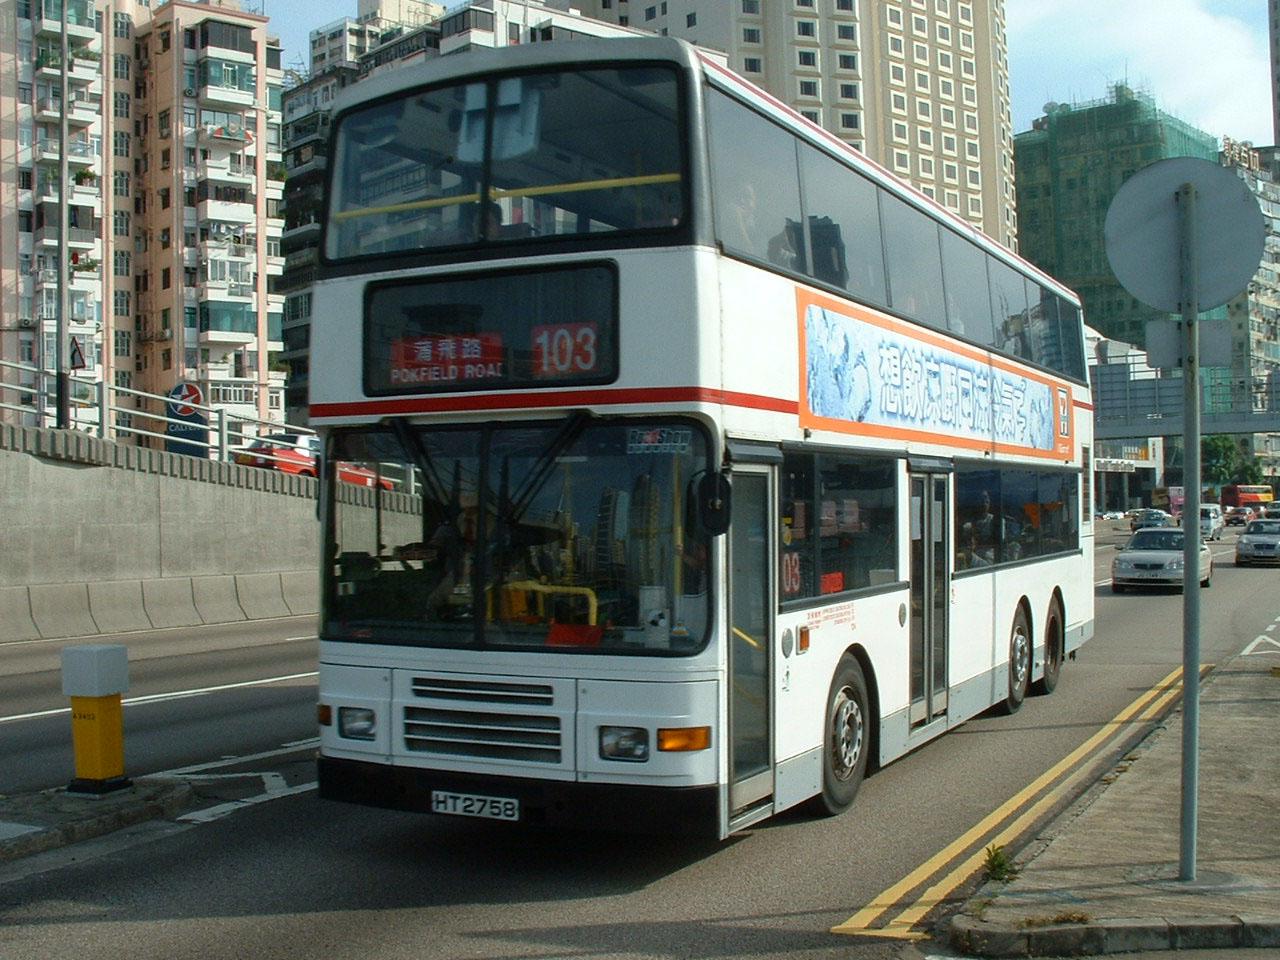 Kmb Kowloon Motor Bus Efe Showbus International Photo Gallery Hong Kong